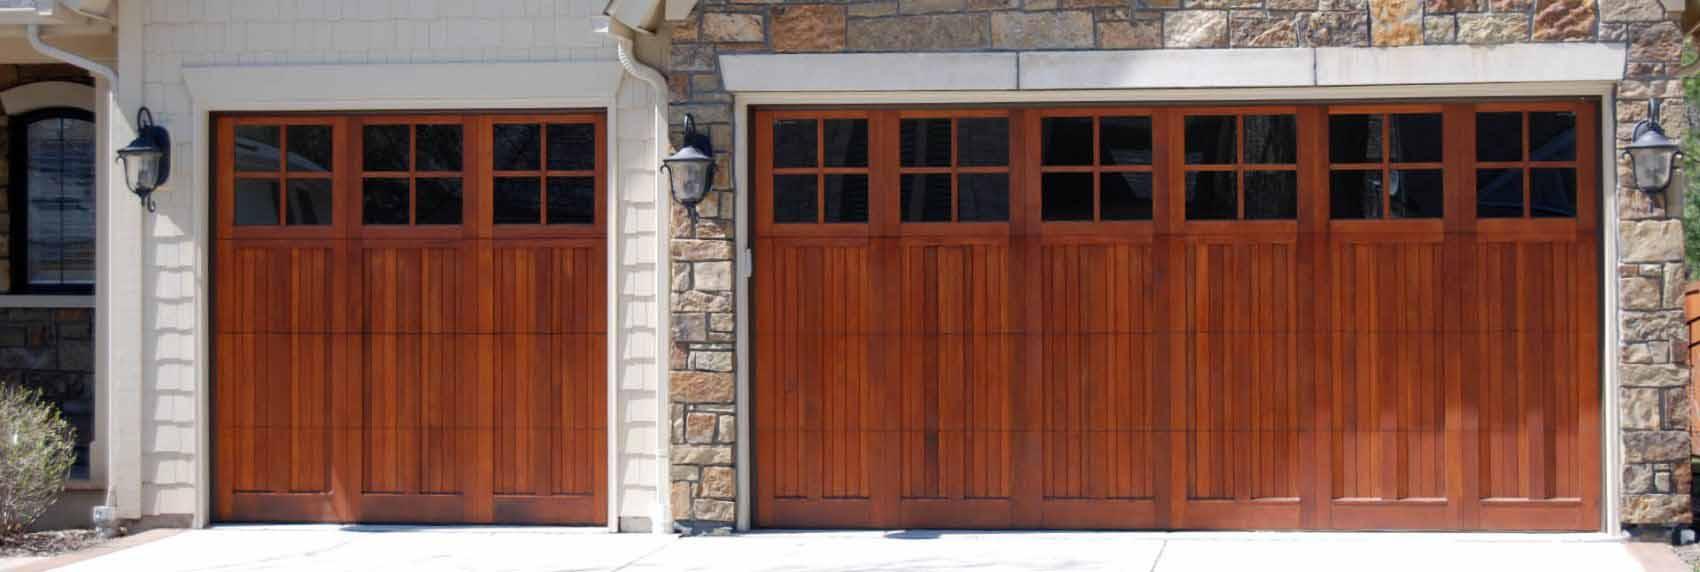 Garage Door Repair Installation Service Dallas Fort Worth